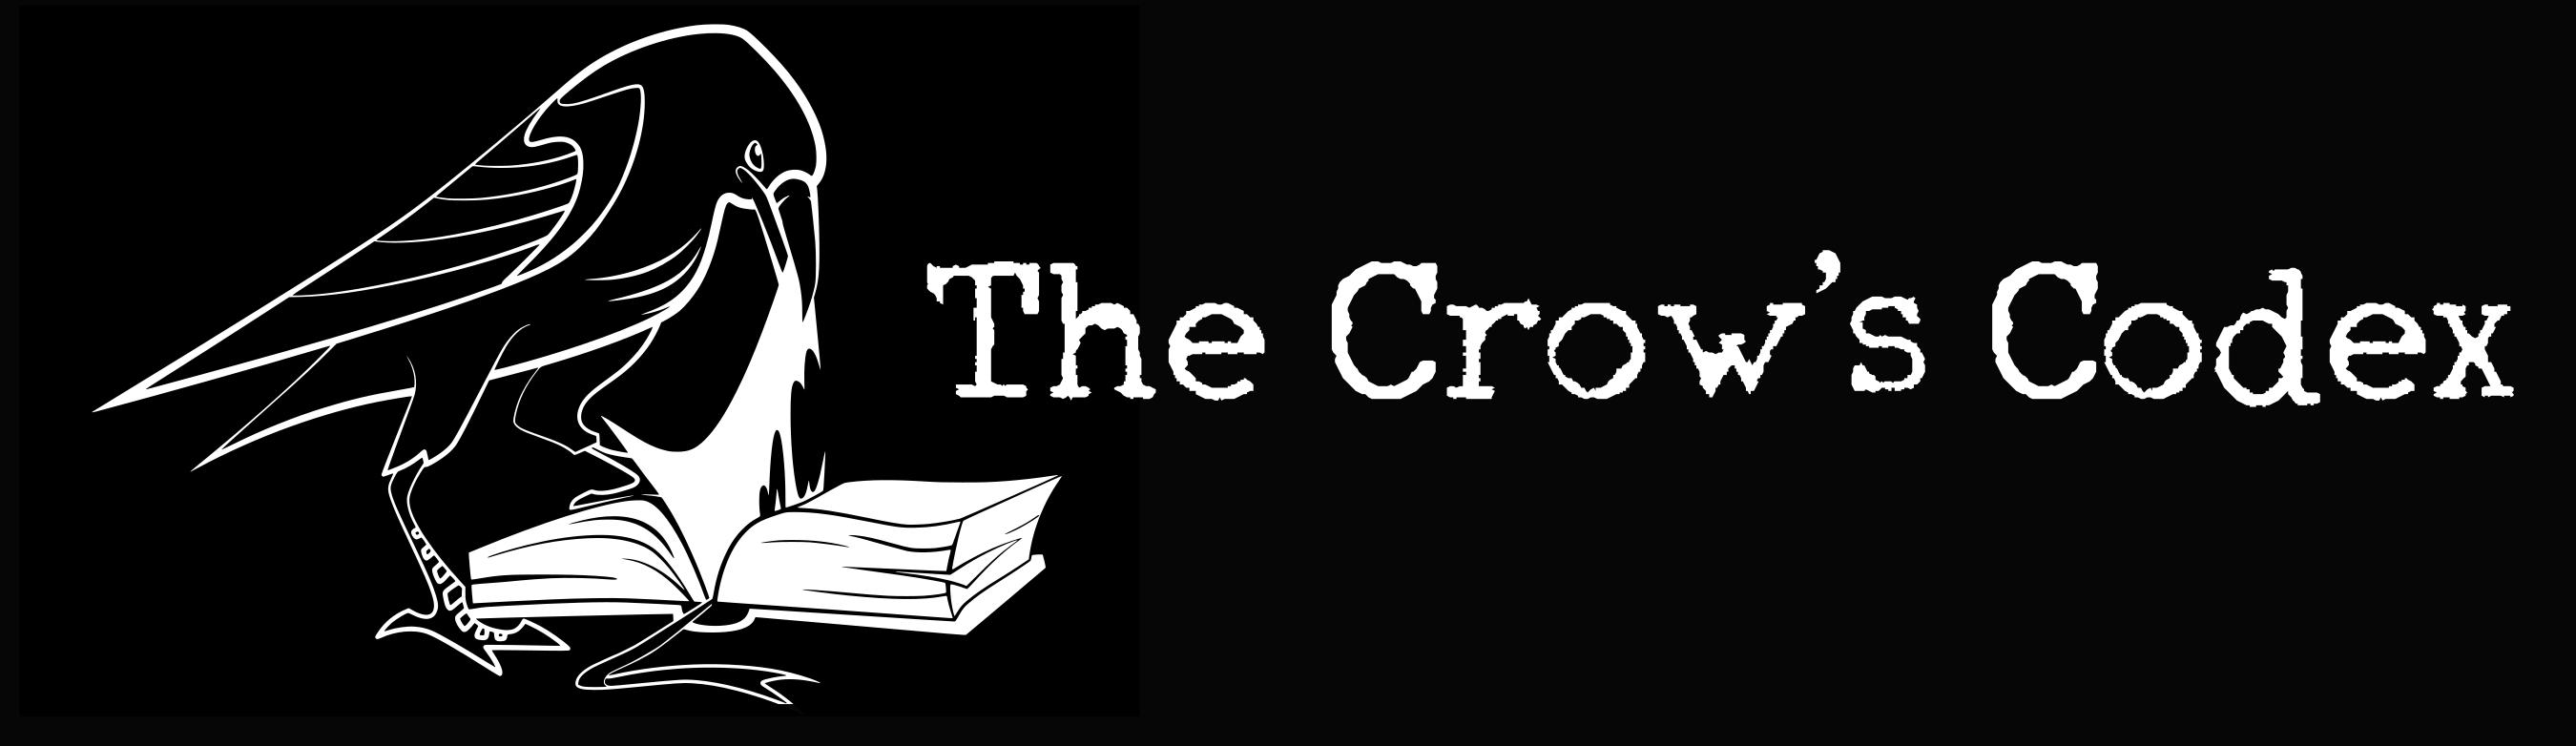 The Crow's Codex